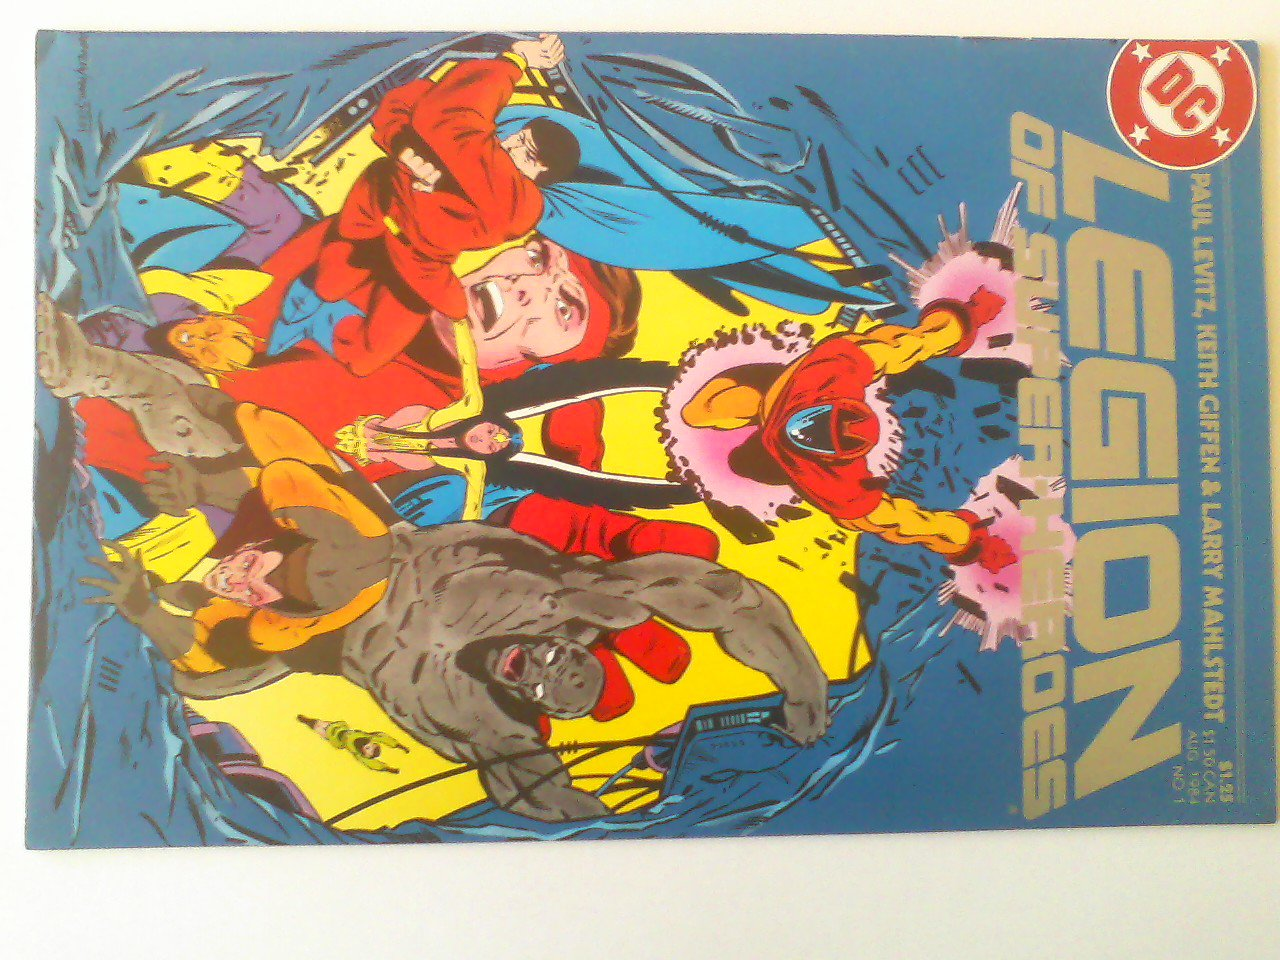 Legion of Super-heroes #1 Paul Levitz/Keith Giffen